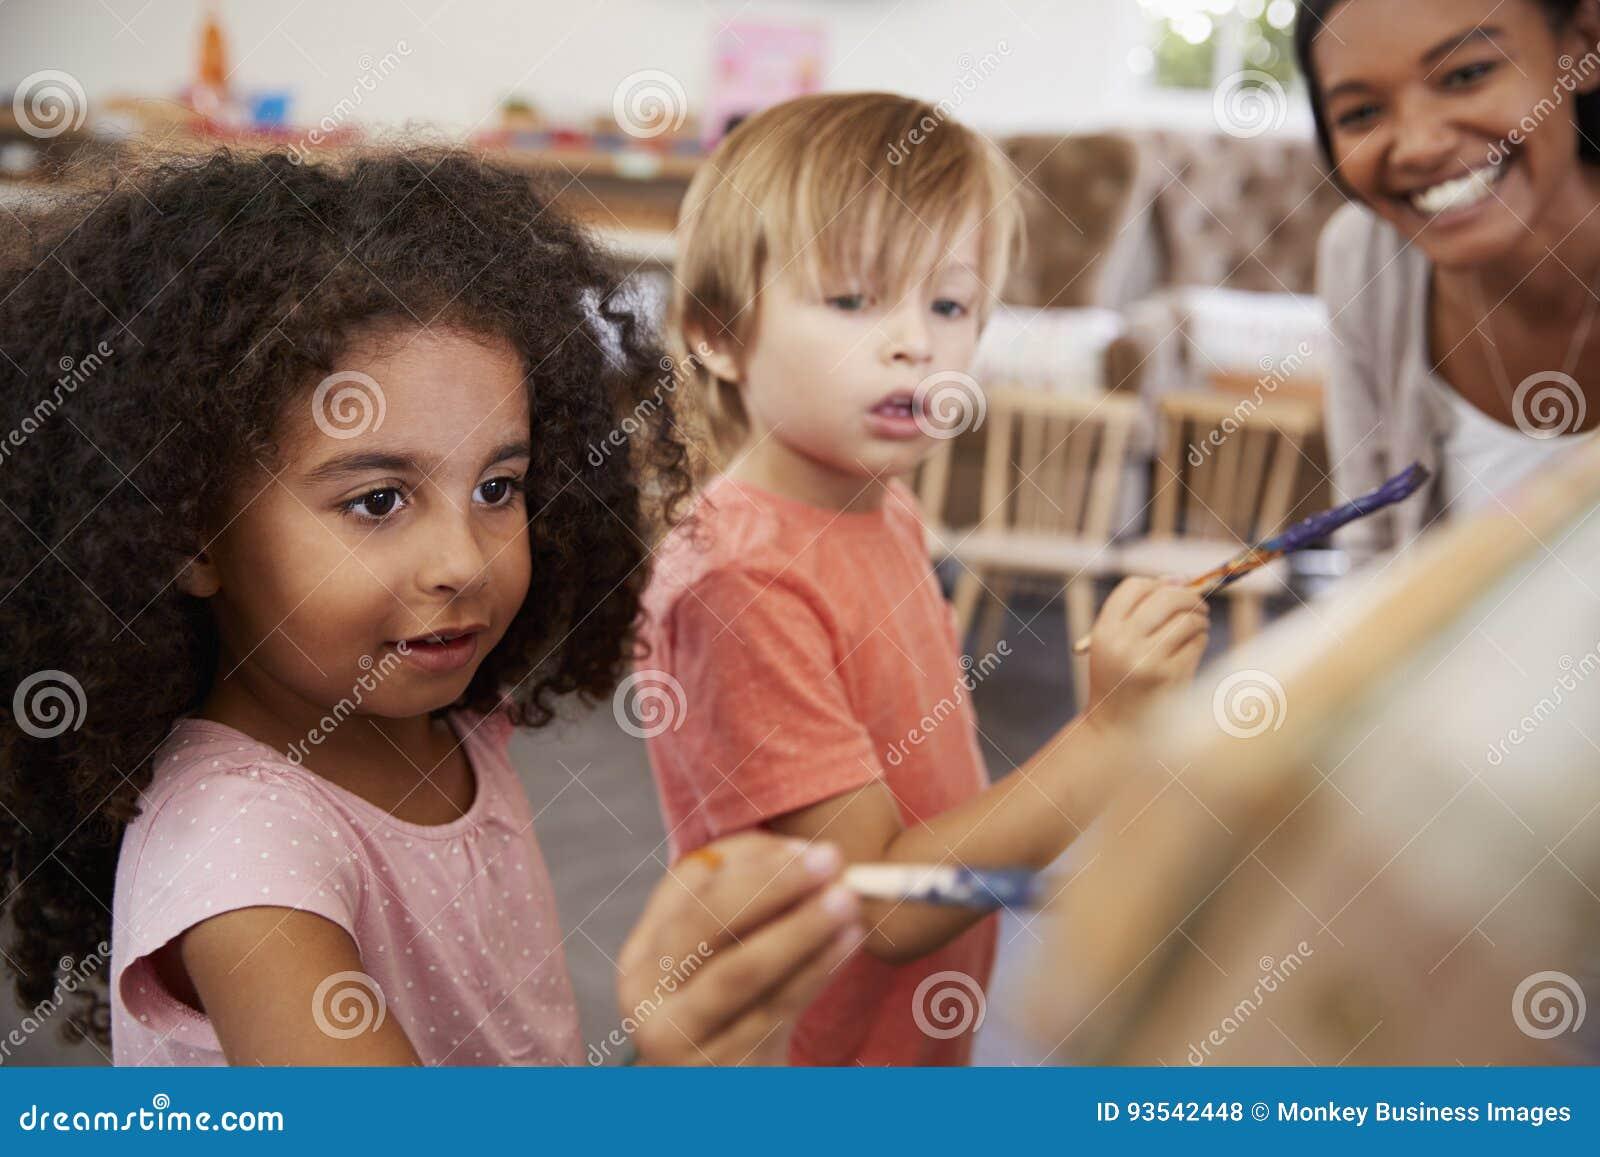 Helfende Kinder Lehrer-At Montessori Schools in Art Class